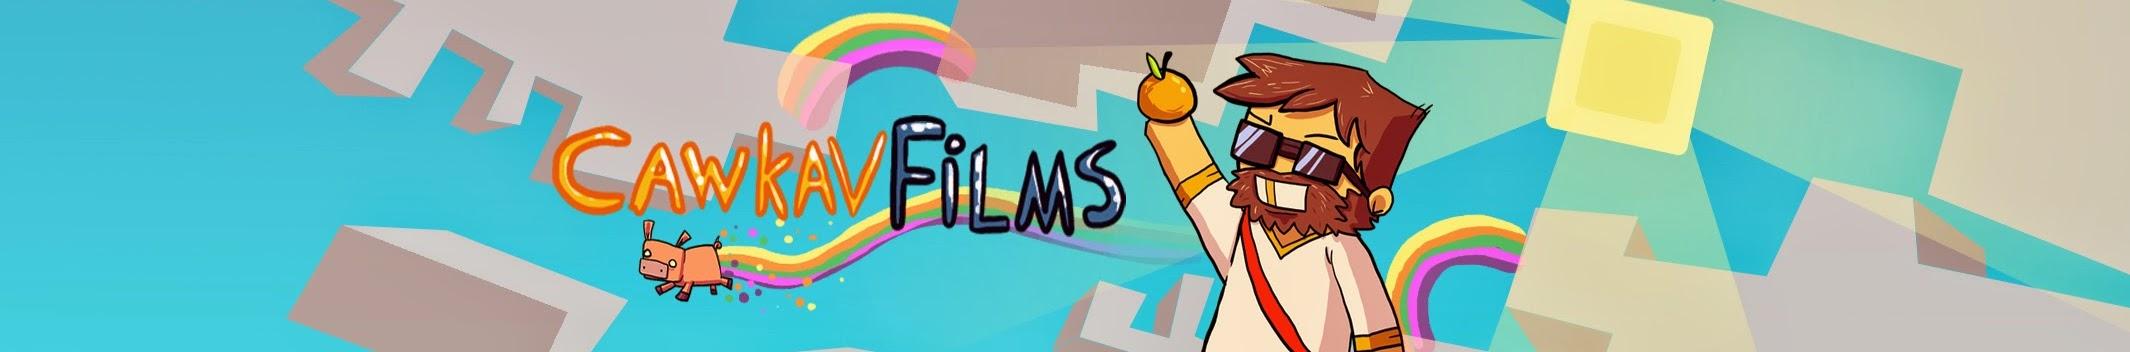 CawkavFilms